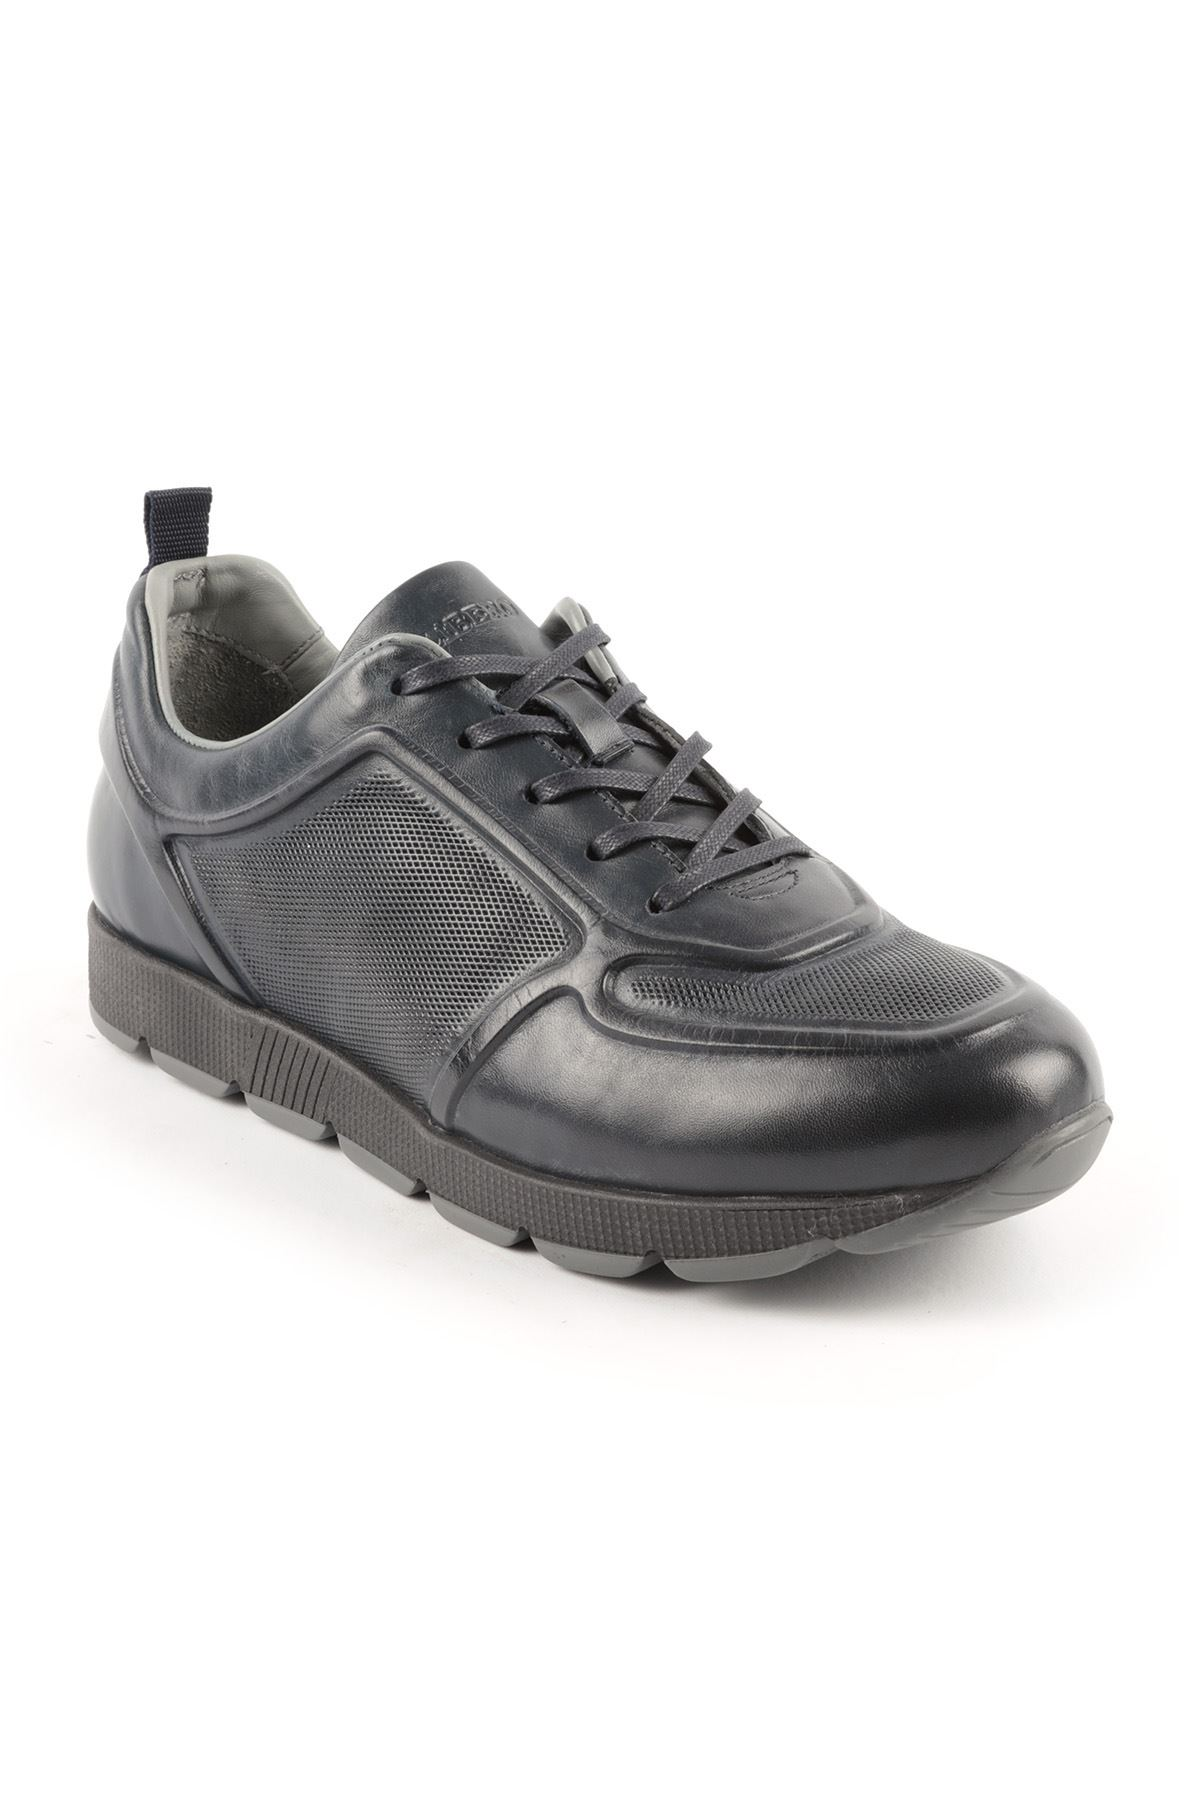 Libero L3497 EA Lacivert Erkek Ayakkabı